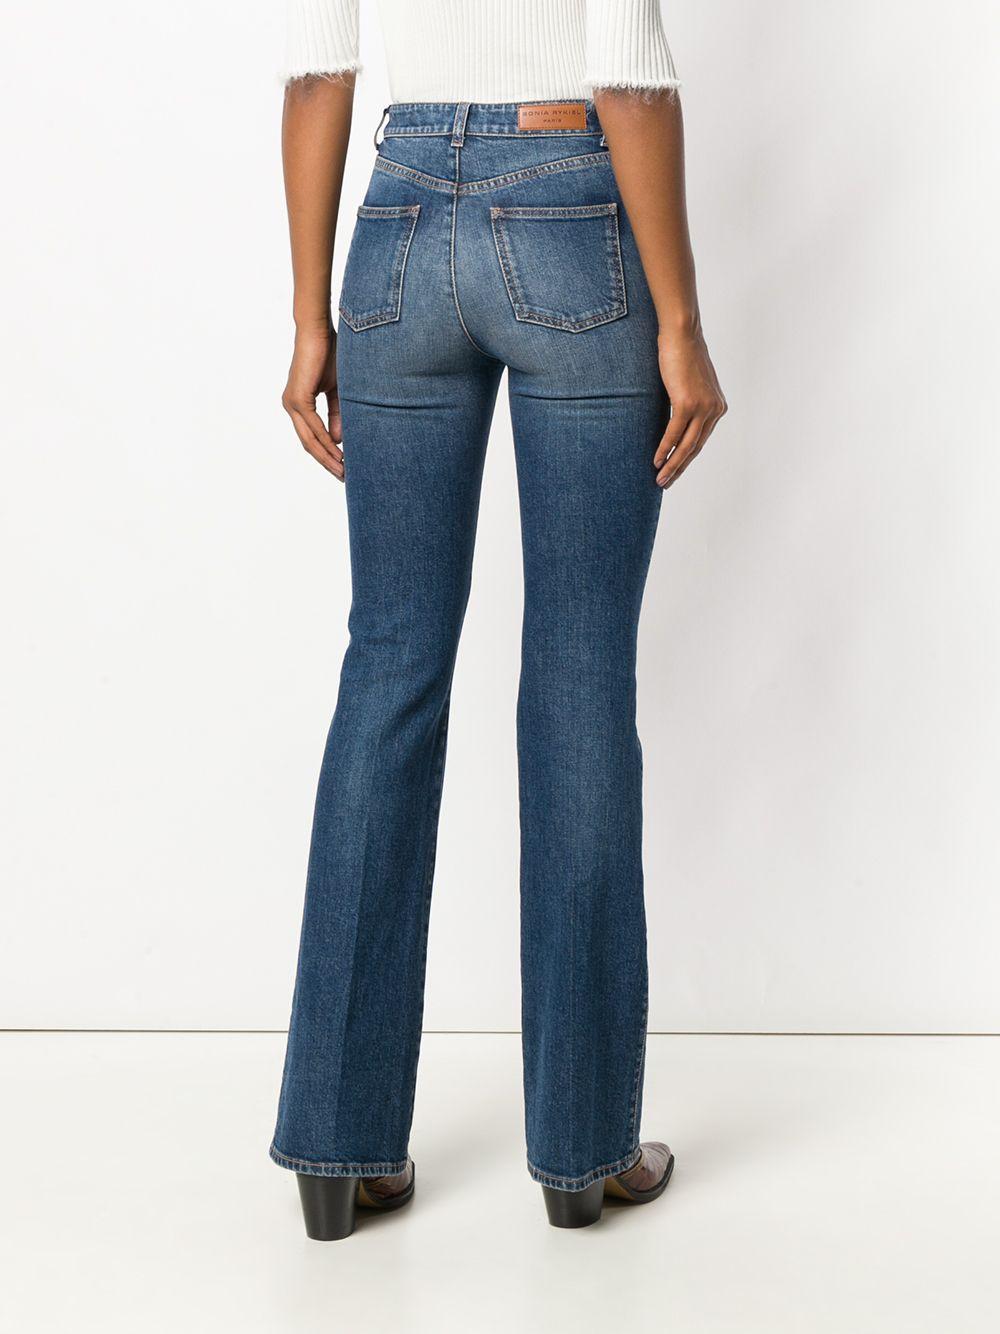 Sonia Rykiel | джинсы с высокой талией | Clouty